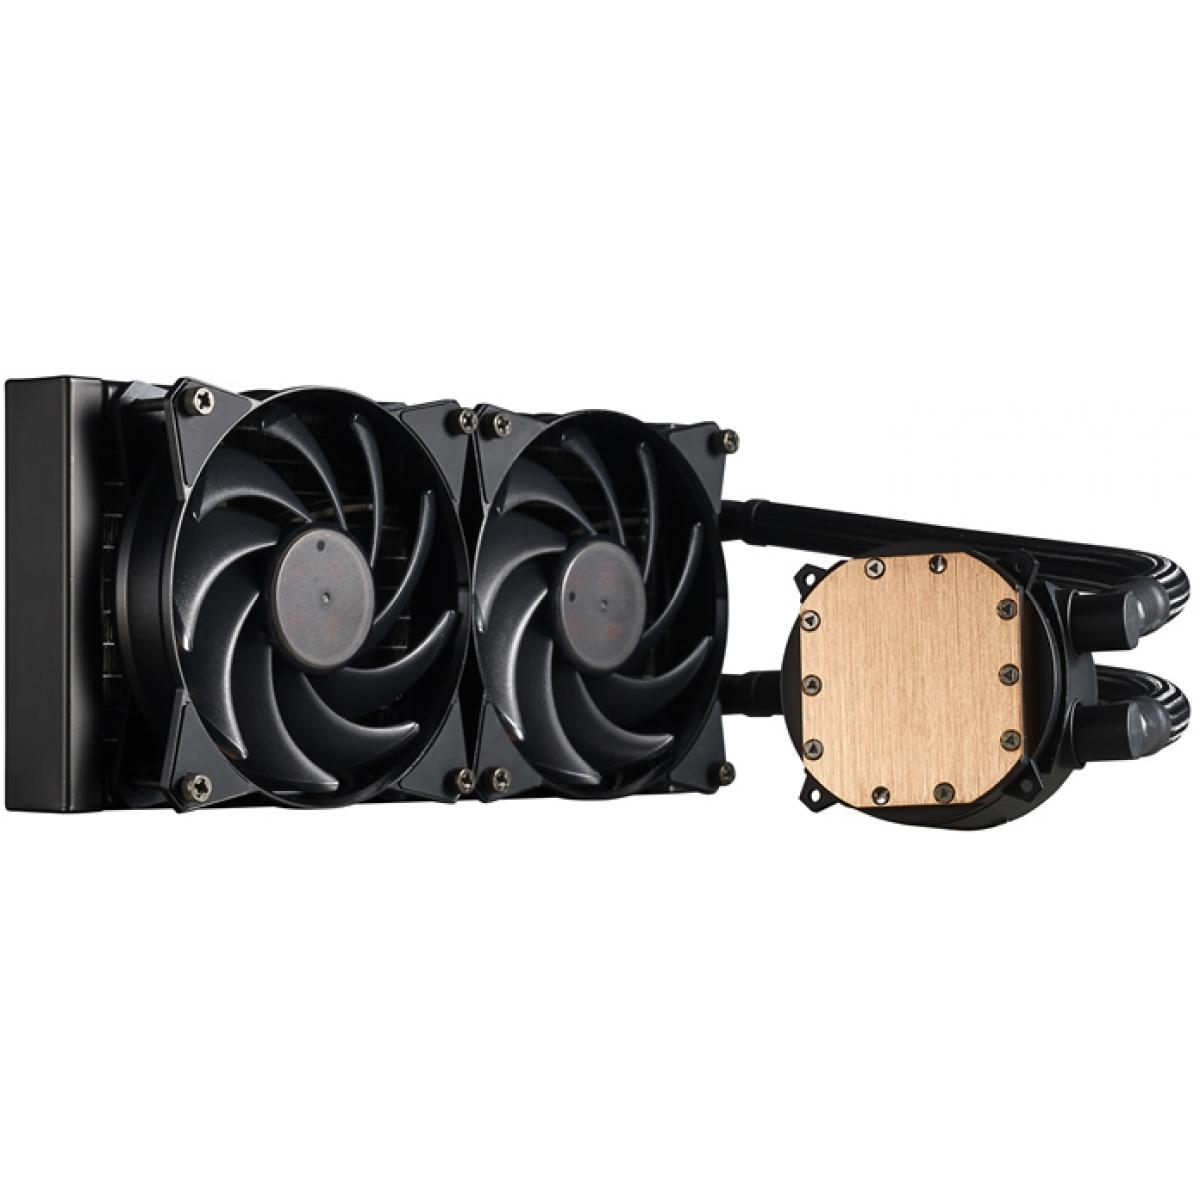 Water Cooler Cooler Master MasterLiquid, 240mm, Intel-AMD, MLX-D24M-A20PW-R1